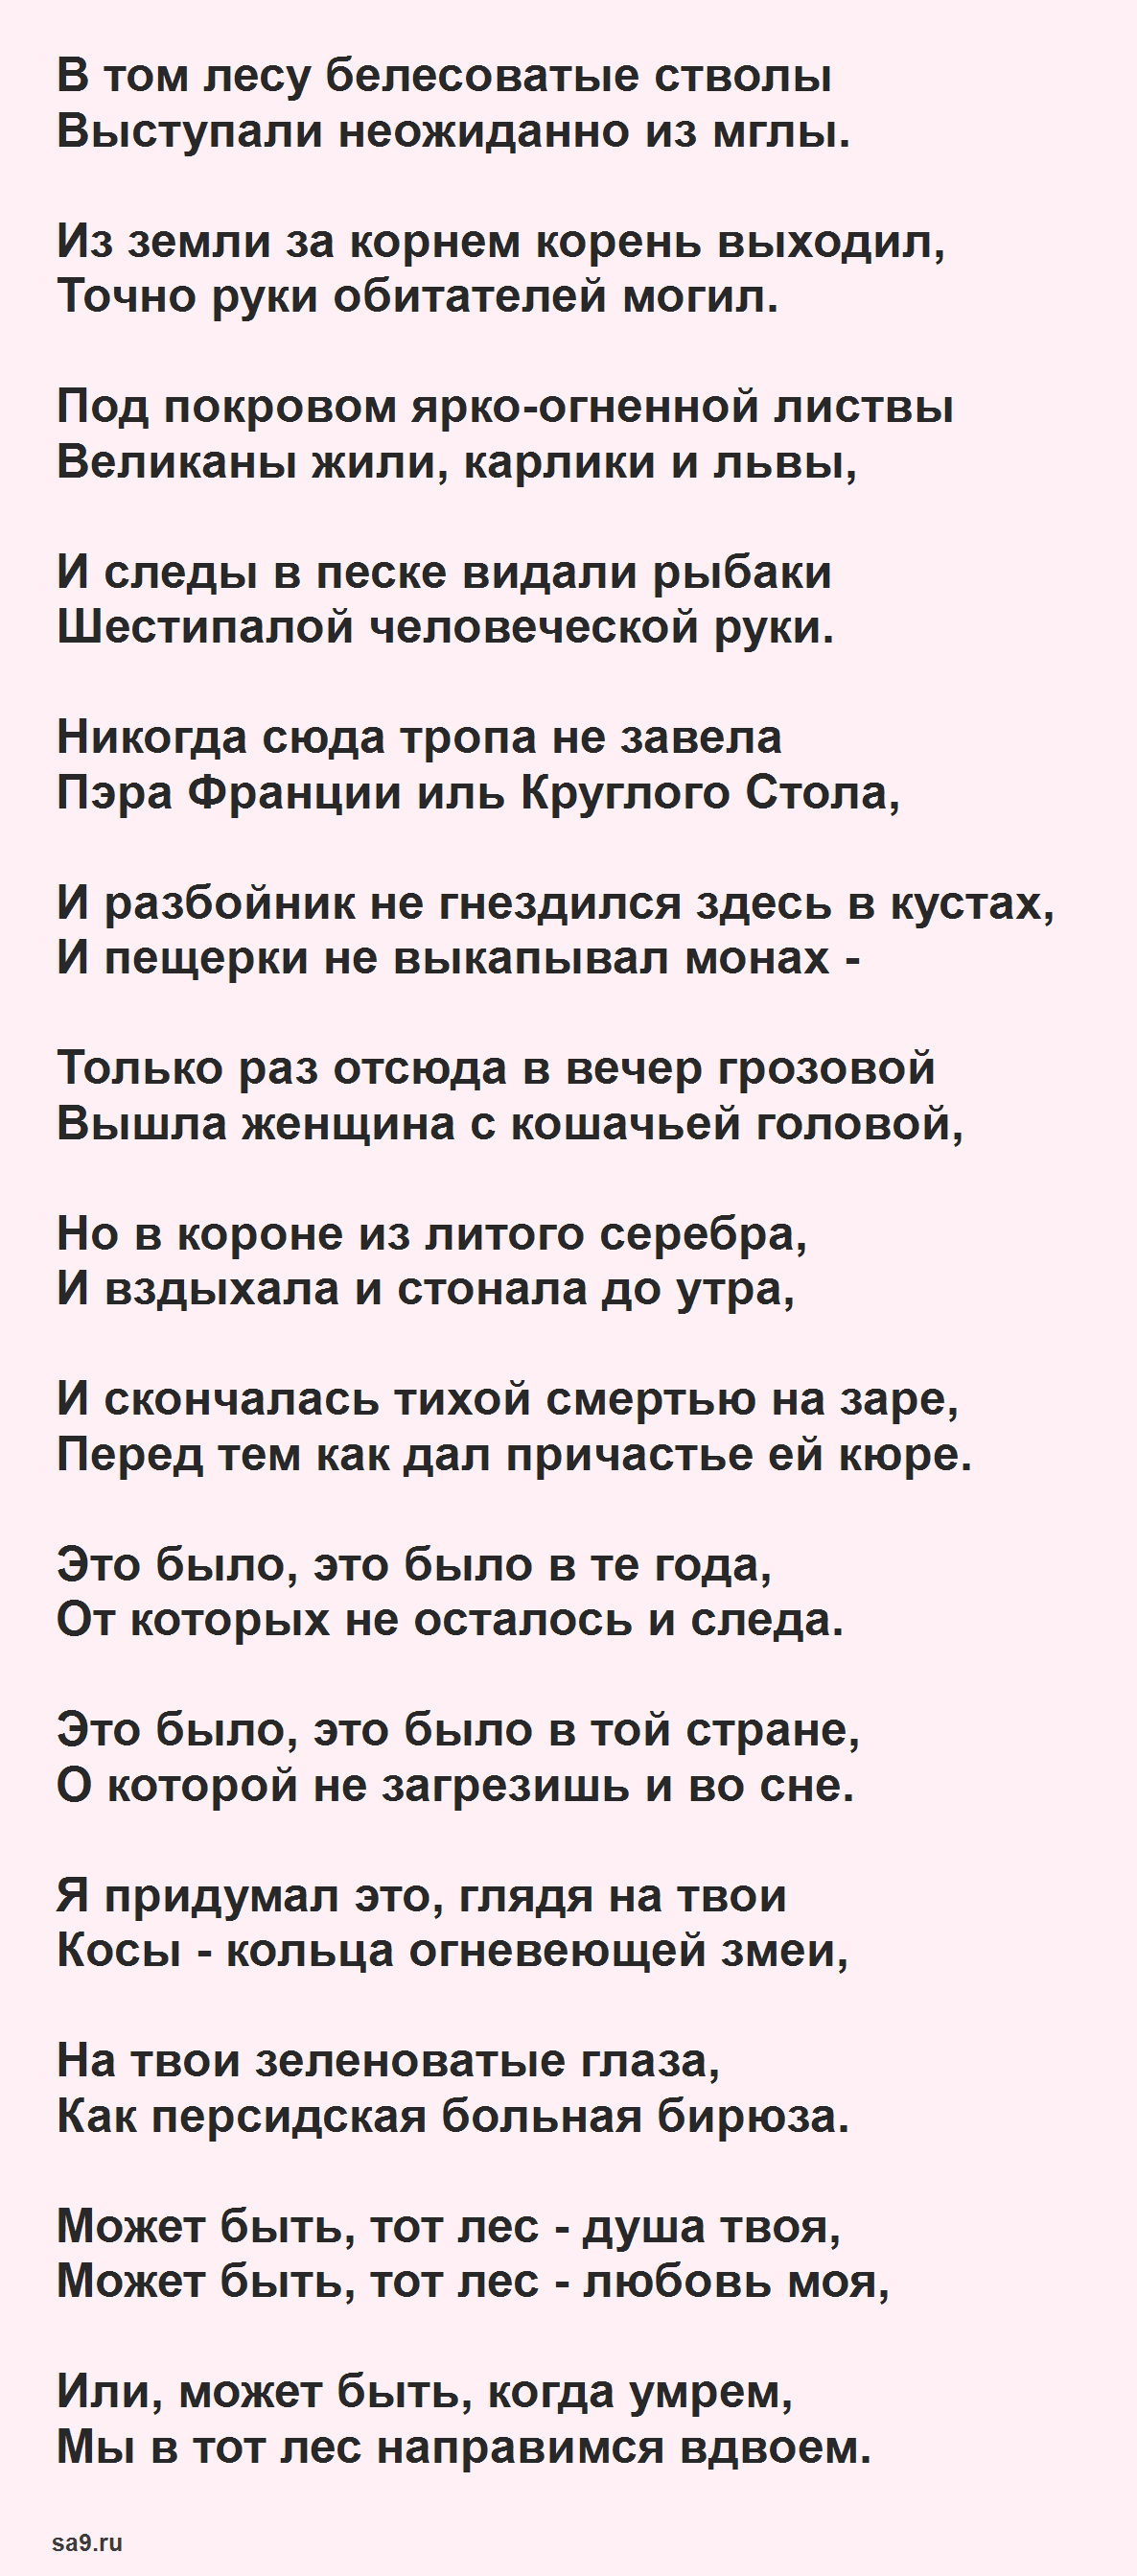 Гумилев стихи - Лес